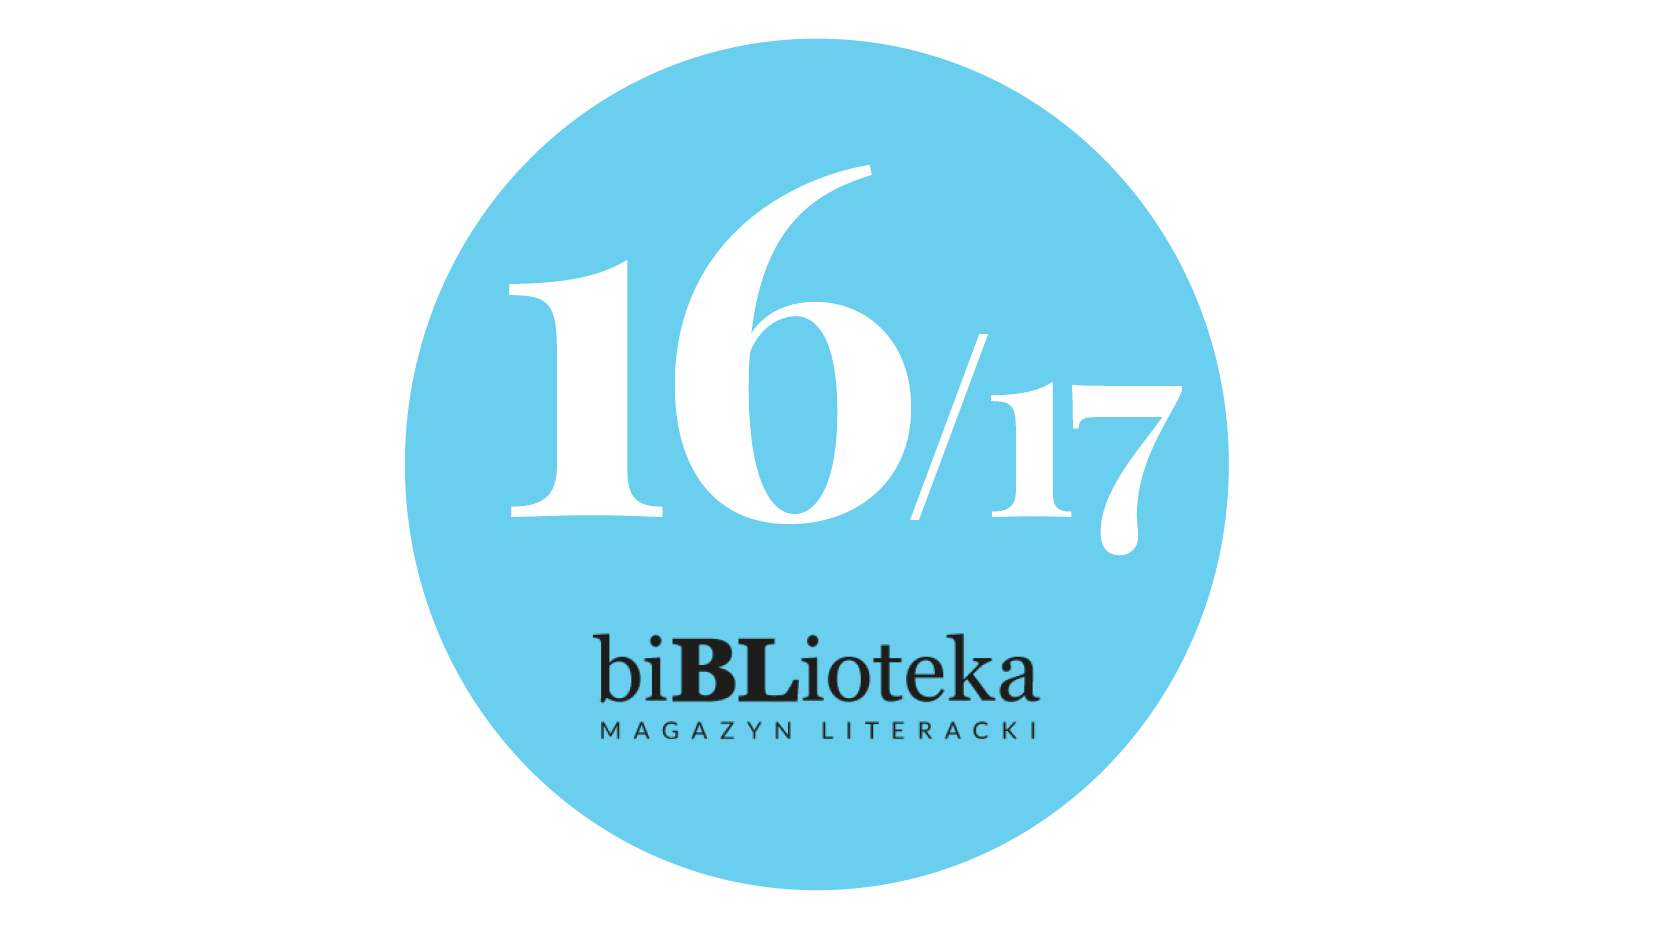 BL Img 2017.08.08 biBLioteka nr 201716_www_top